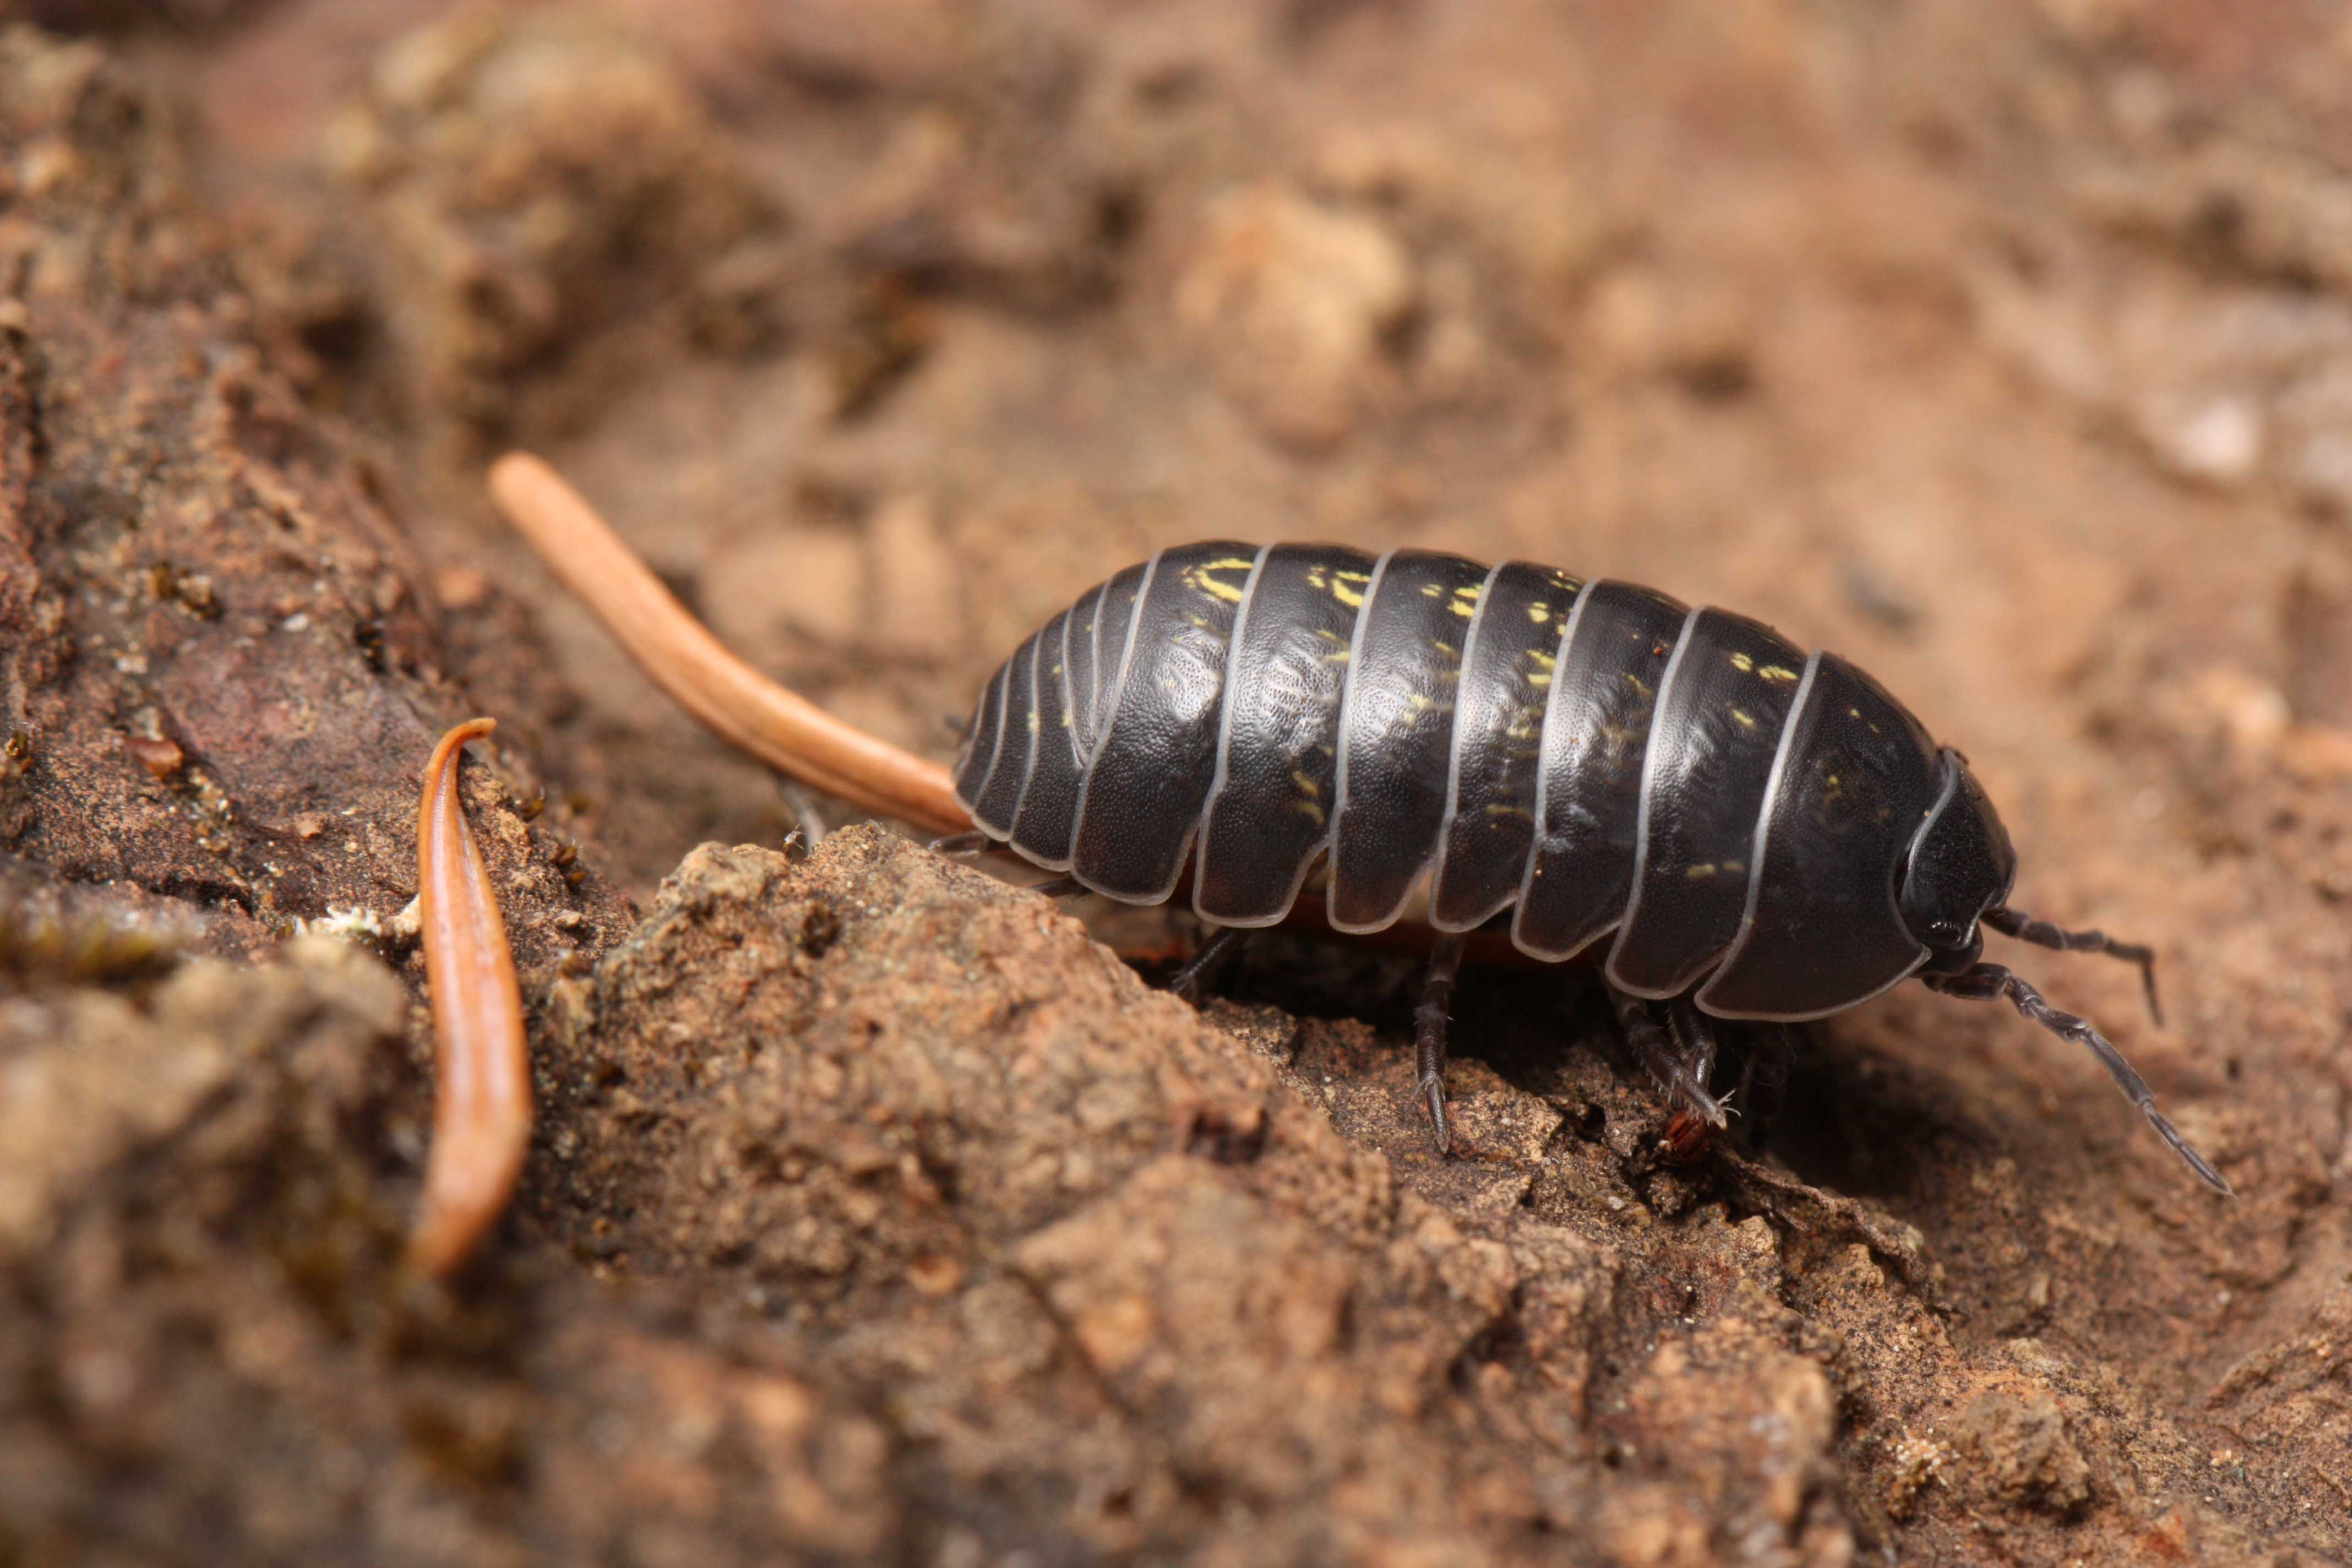 Shorelines » Blog Archive The Scavenger Bug That Fights